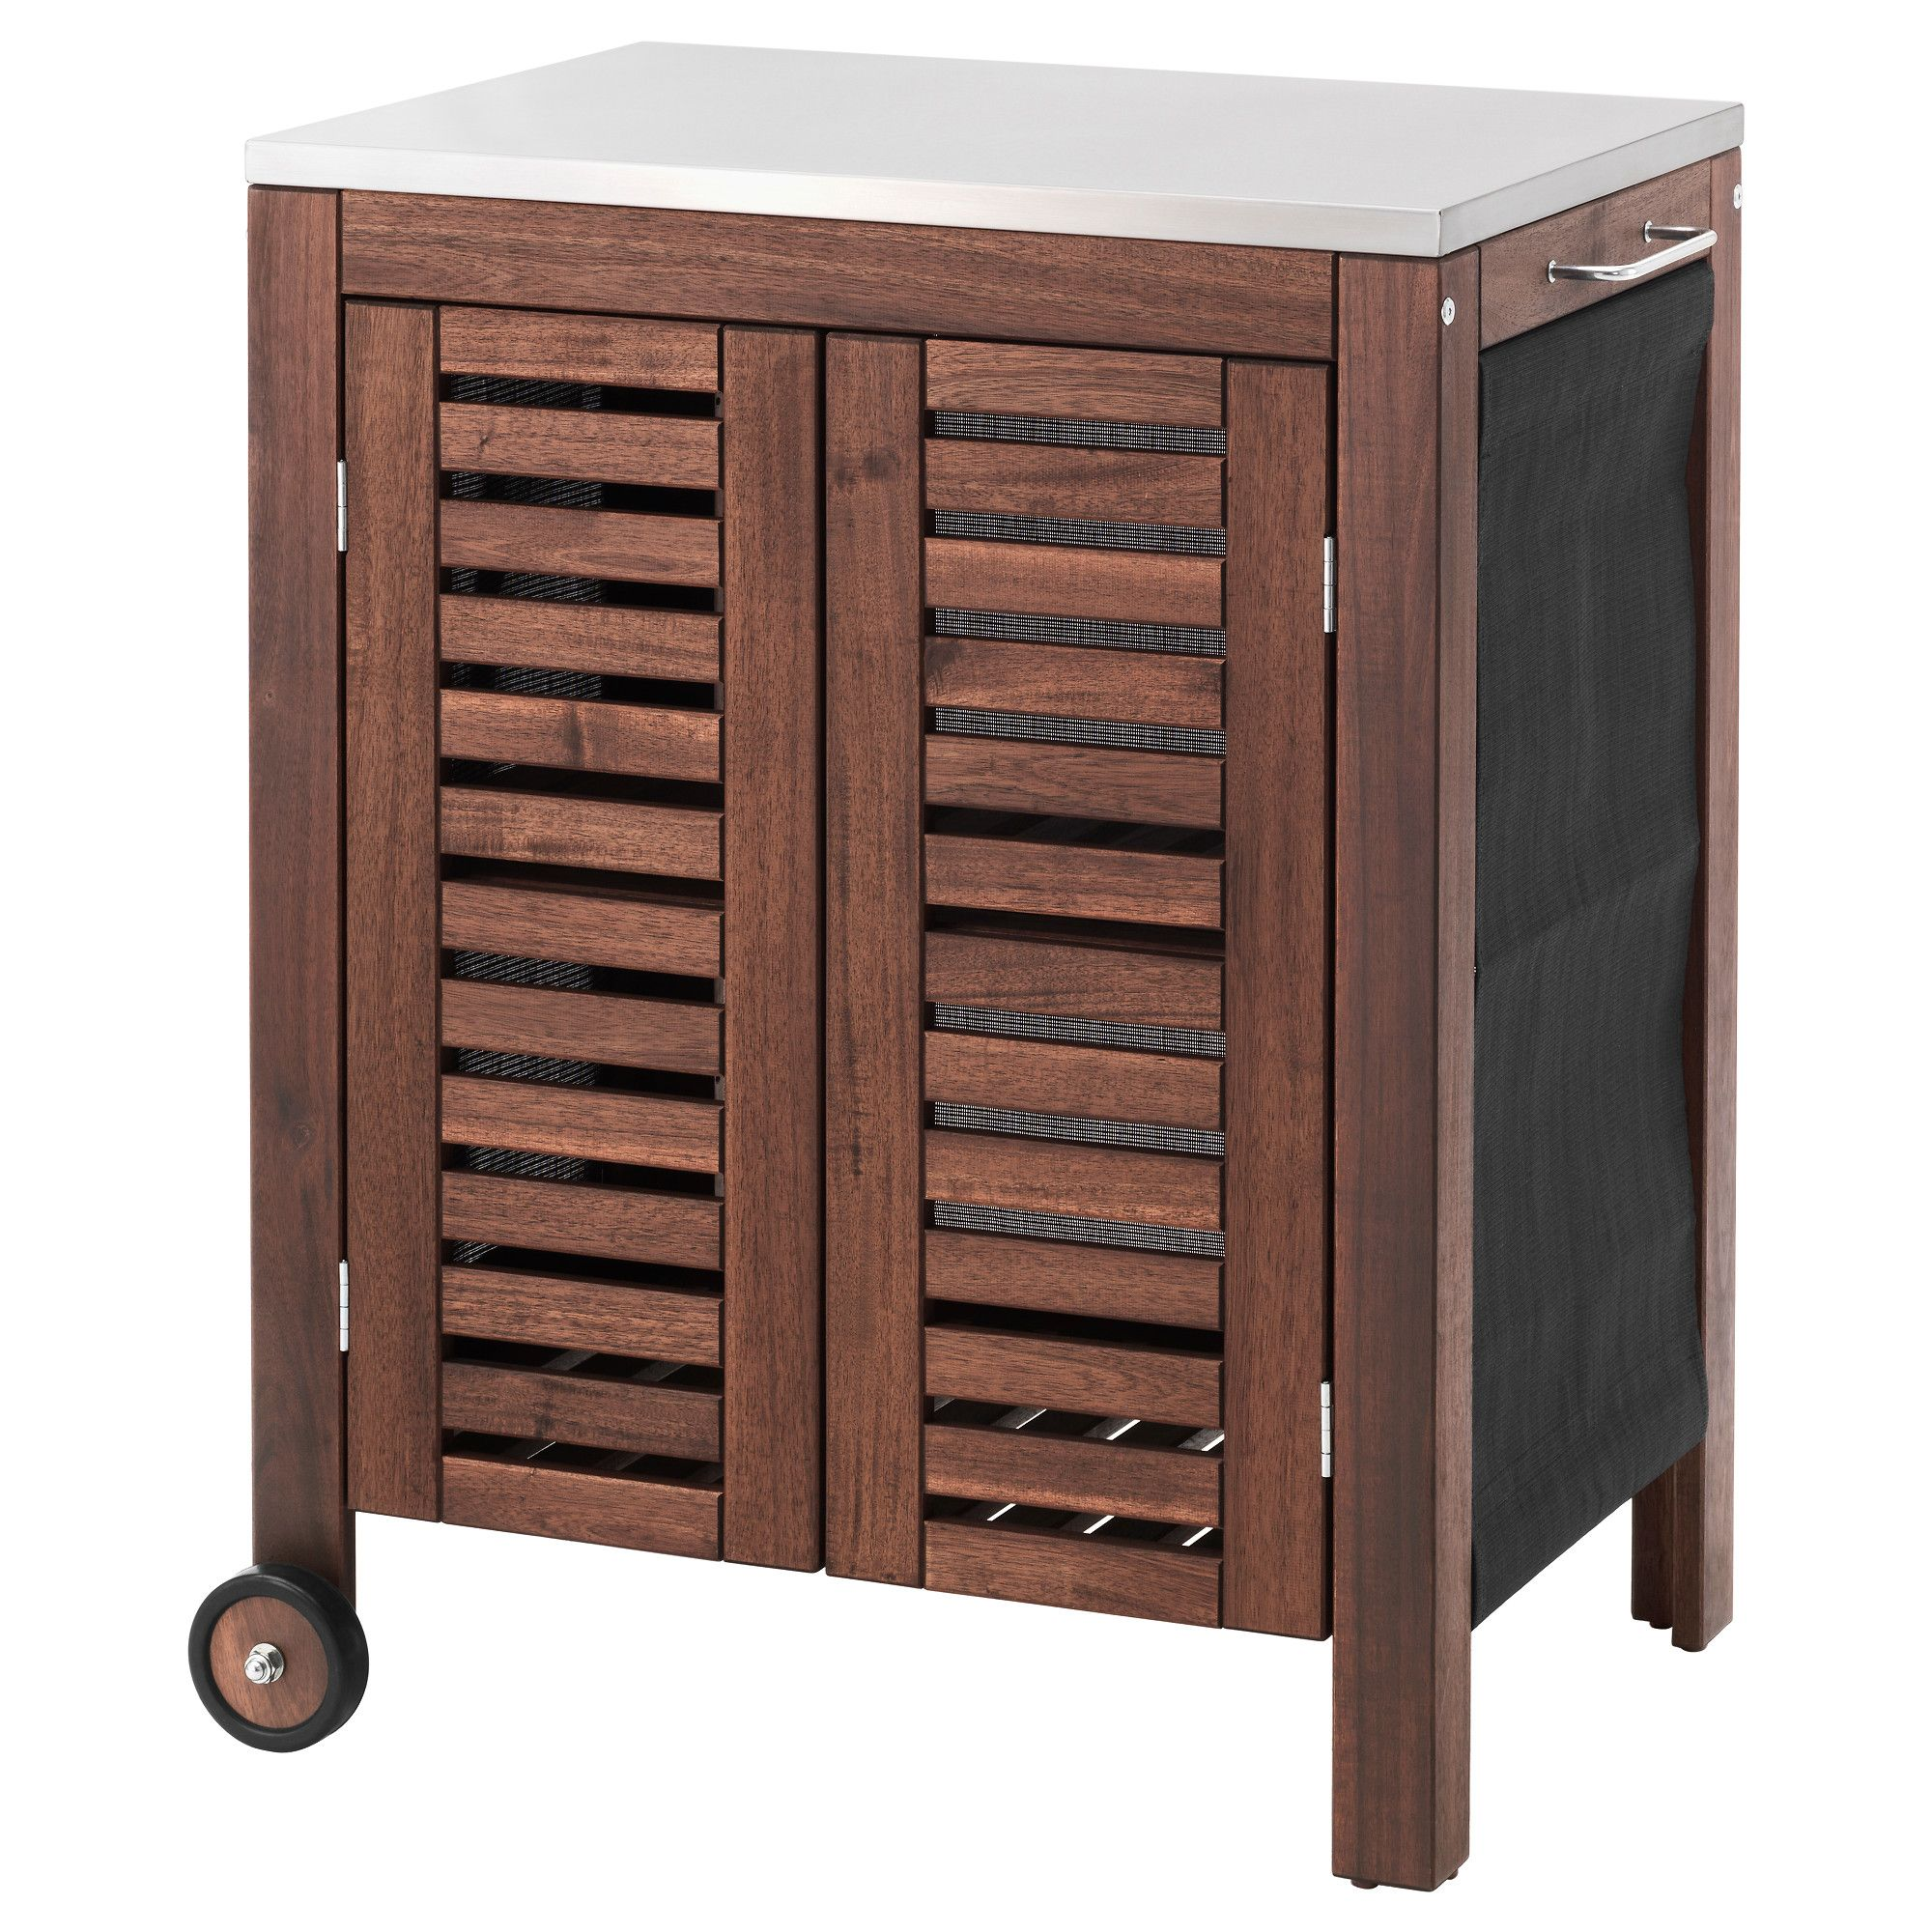 Applaro Klasen Storage Cabinet Outdoor Brown Stained Stainless Steel Color Ikea Ikea Applaro Ikea Wandpaneele